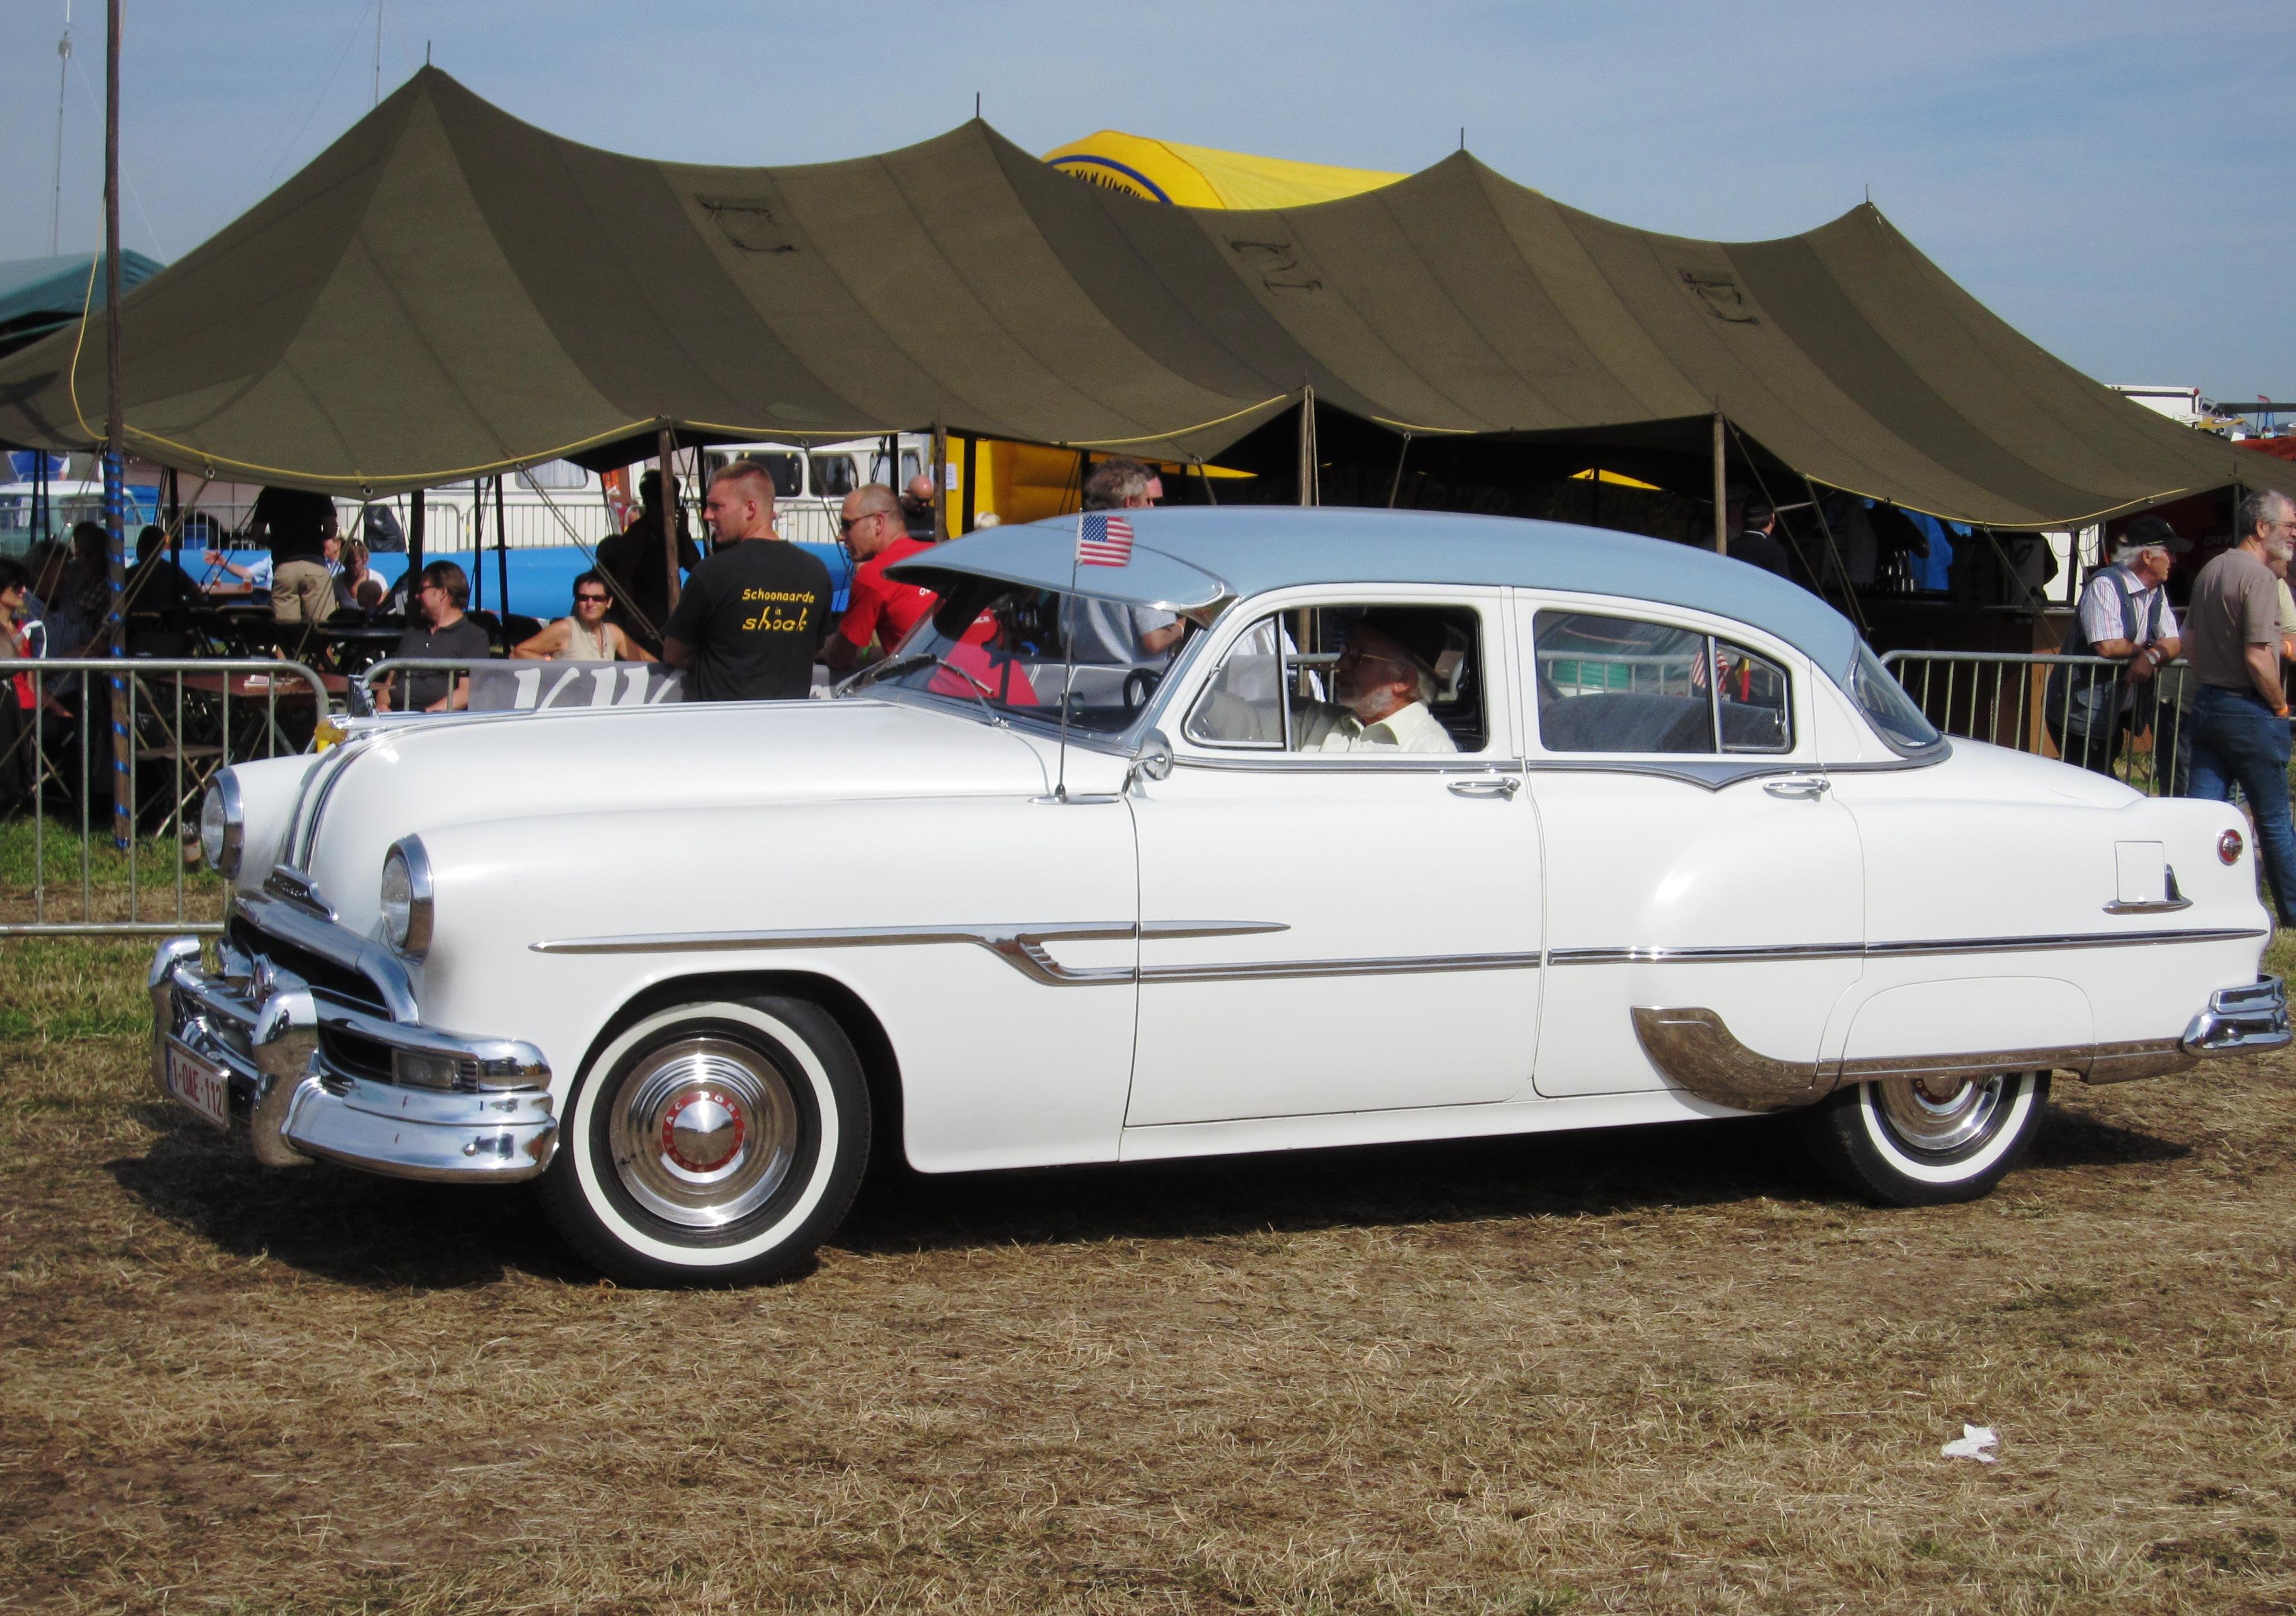 1954 Pontiac Chieftain - Compare Prices,.